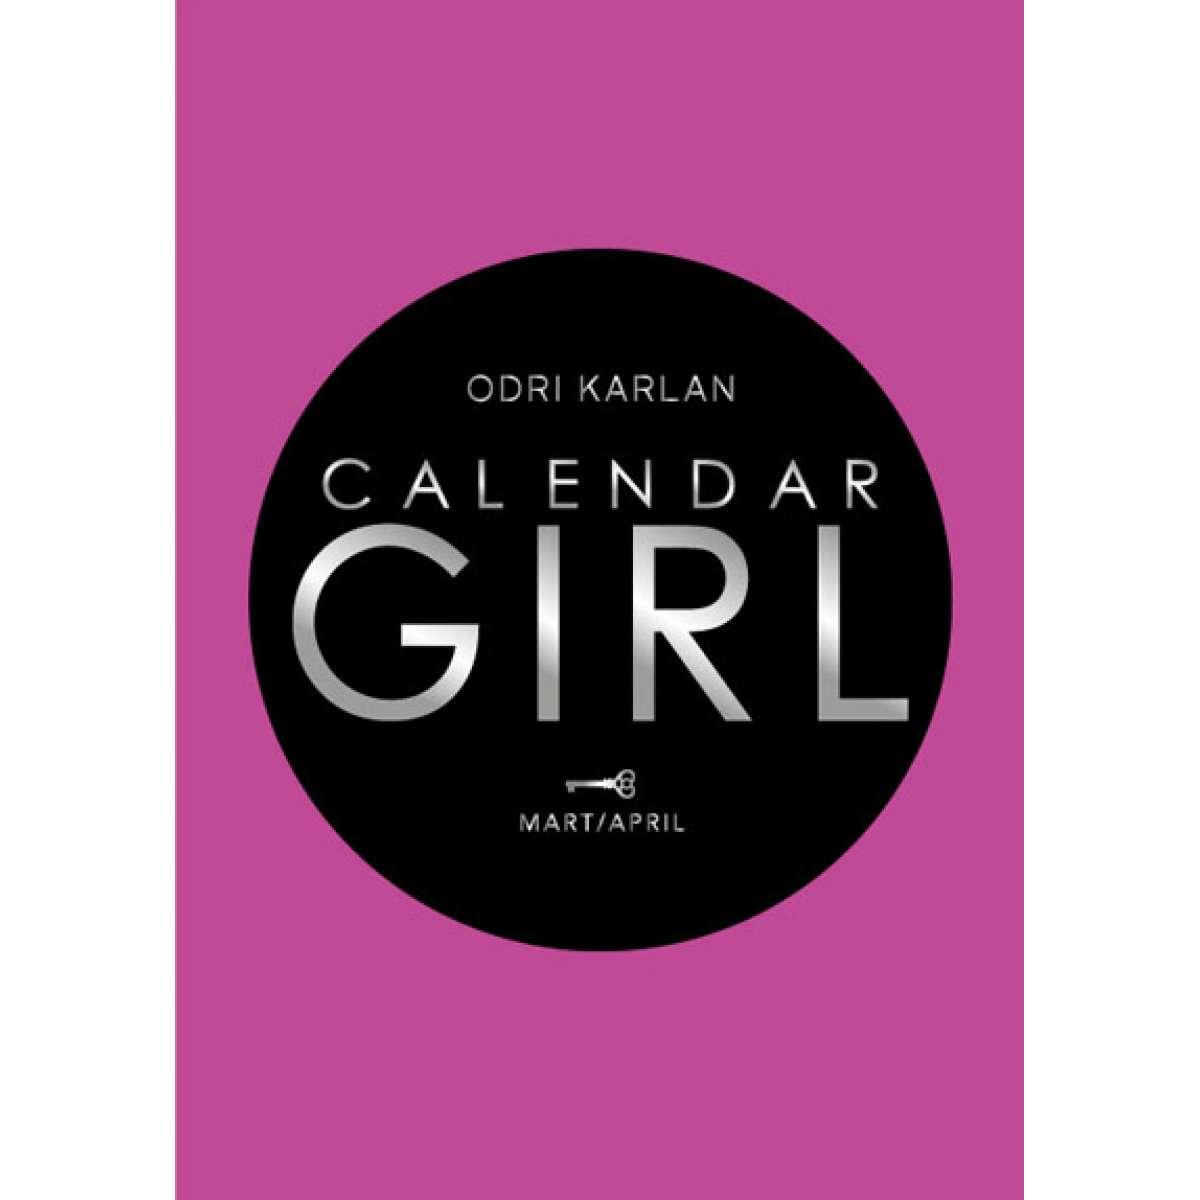 CALENDAR GIRL: MART/APRIL